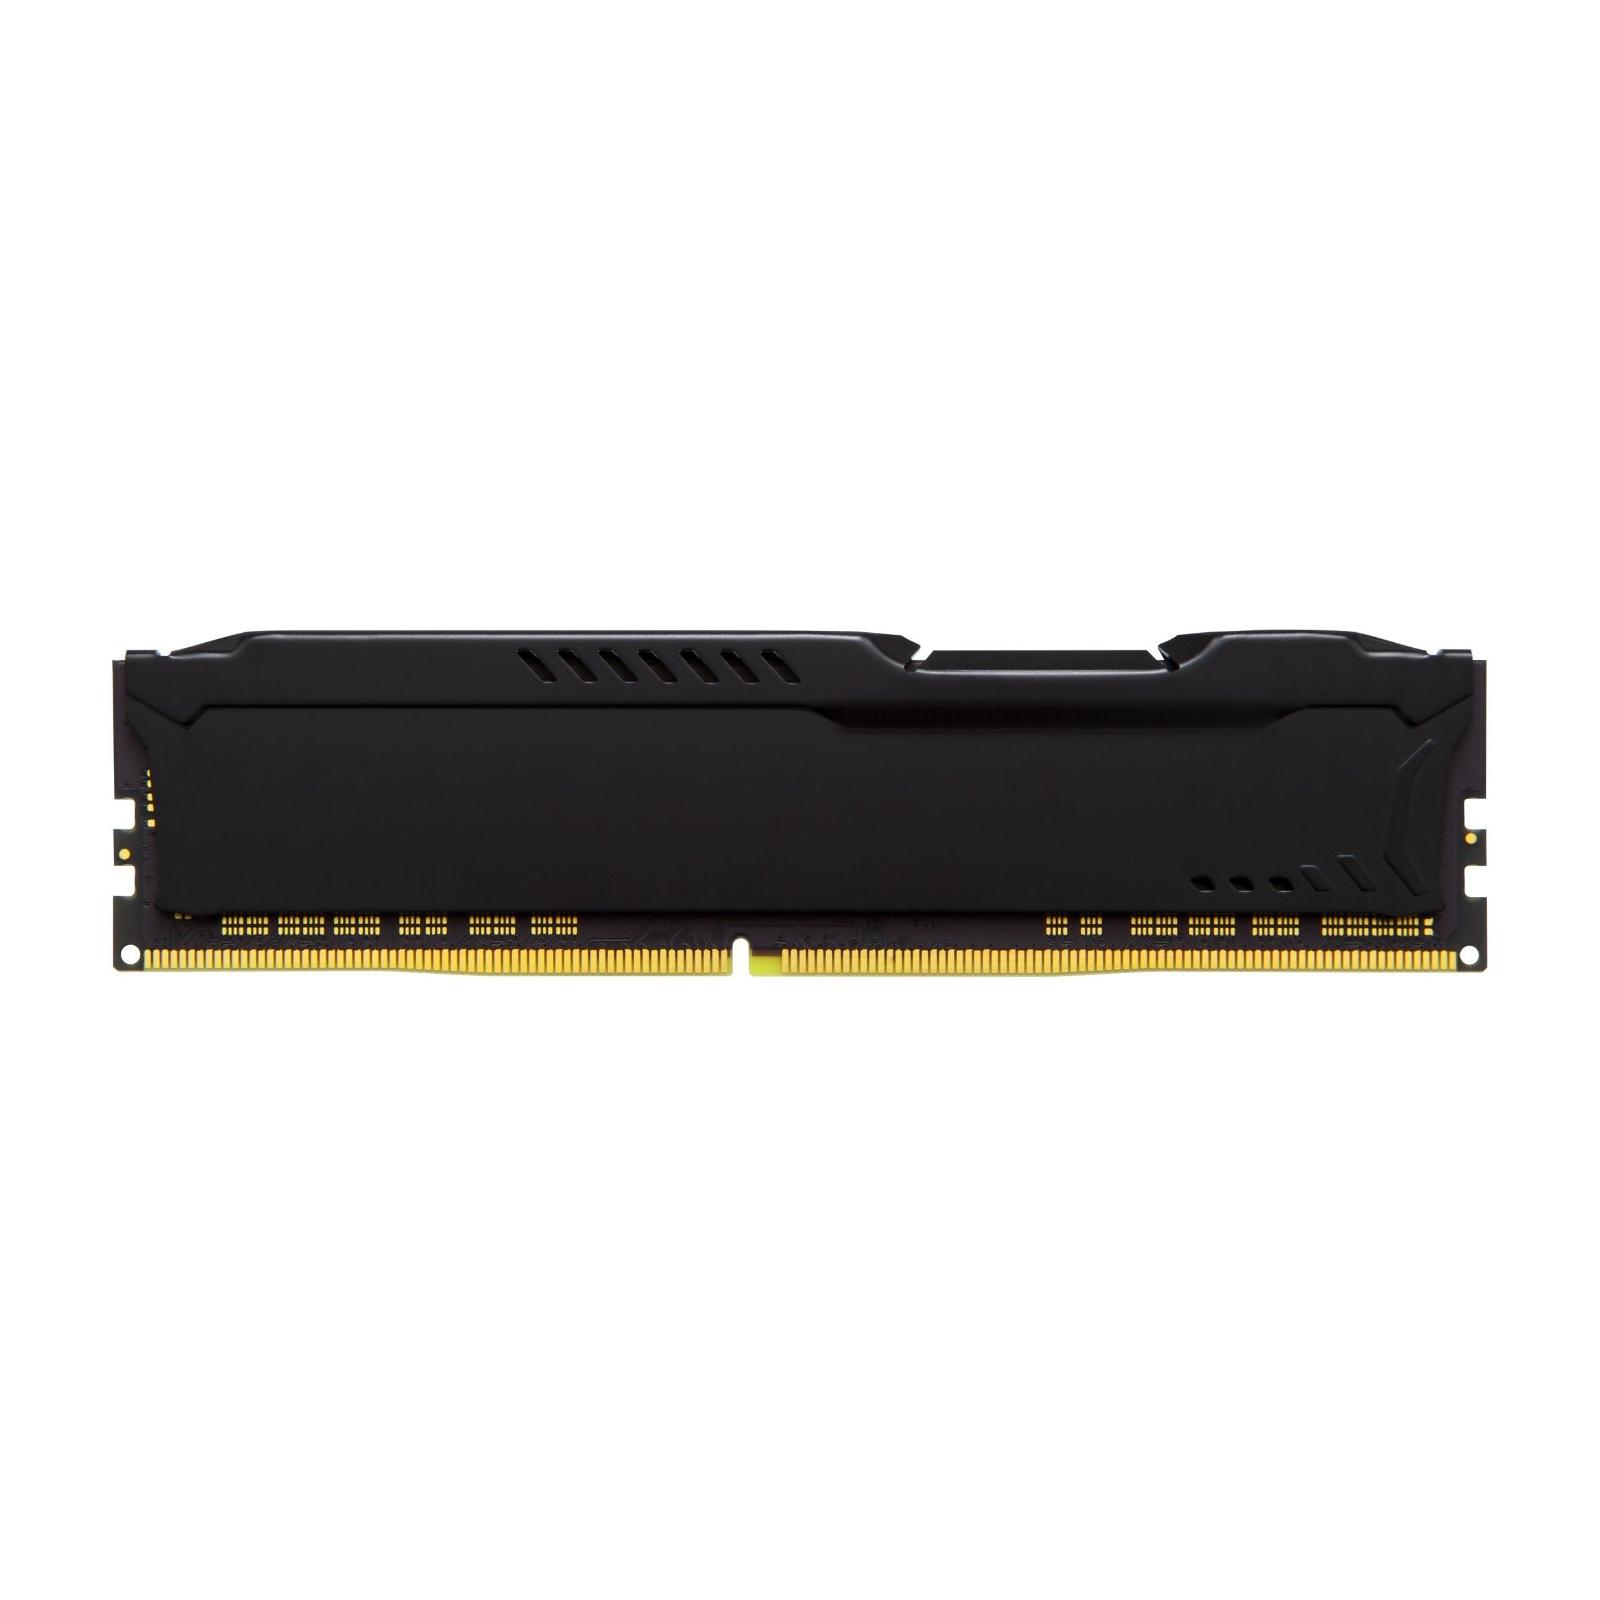 Модуль памяти для компьютера DDR4 8GB 2133 MHz HyperX FURY Black Kingston (HX421C14FB2/8) изображение 3